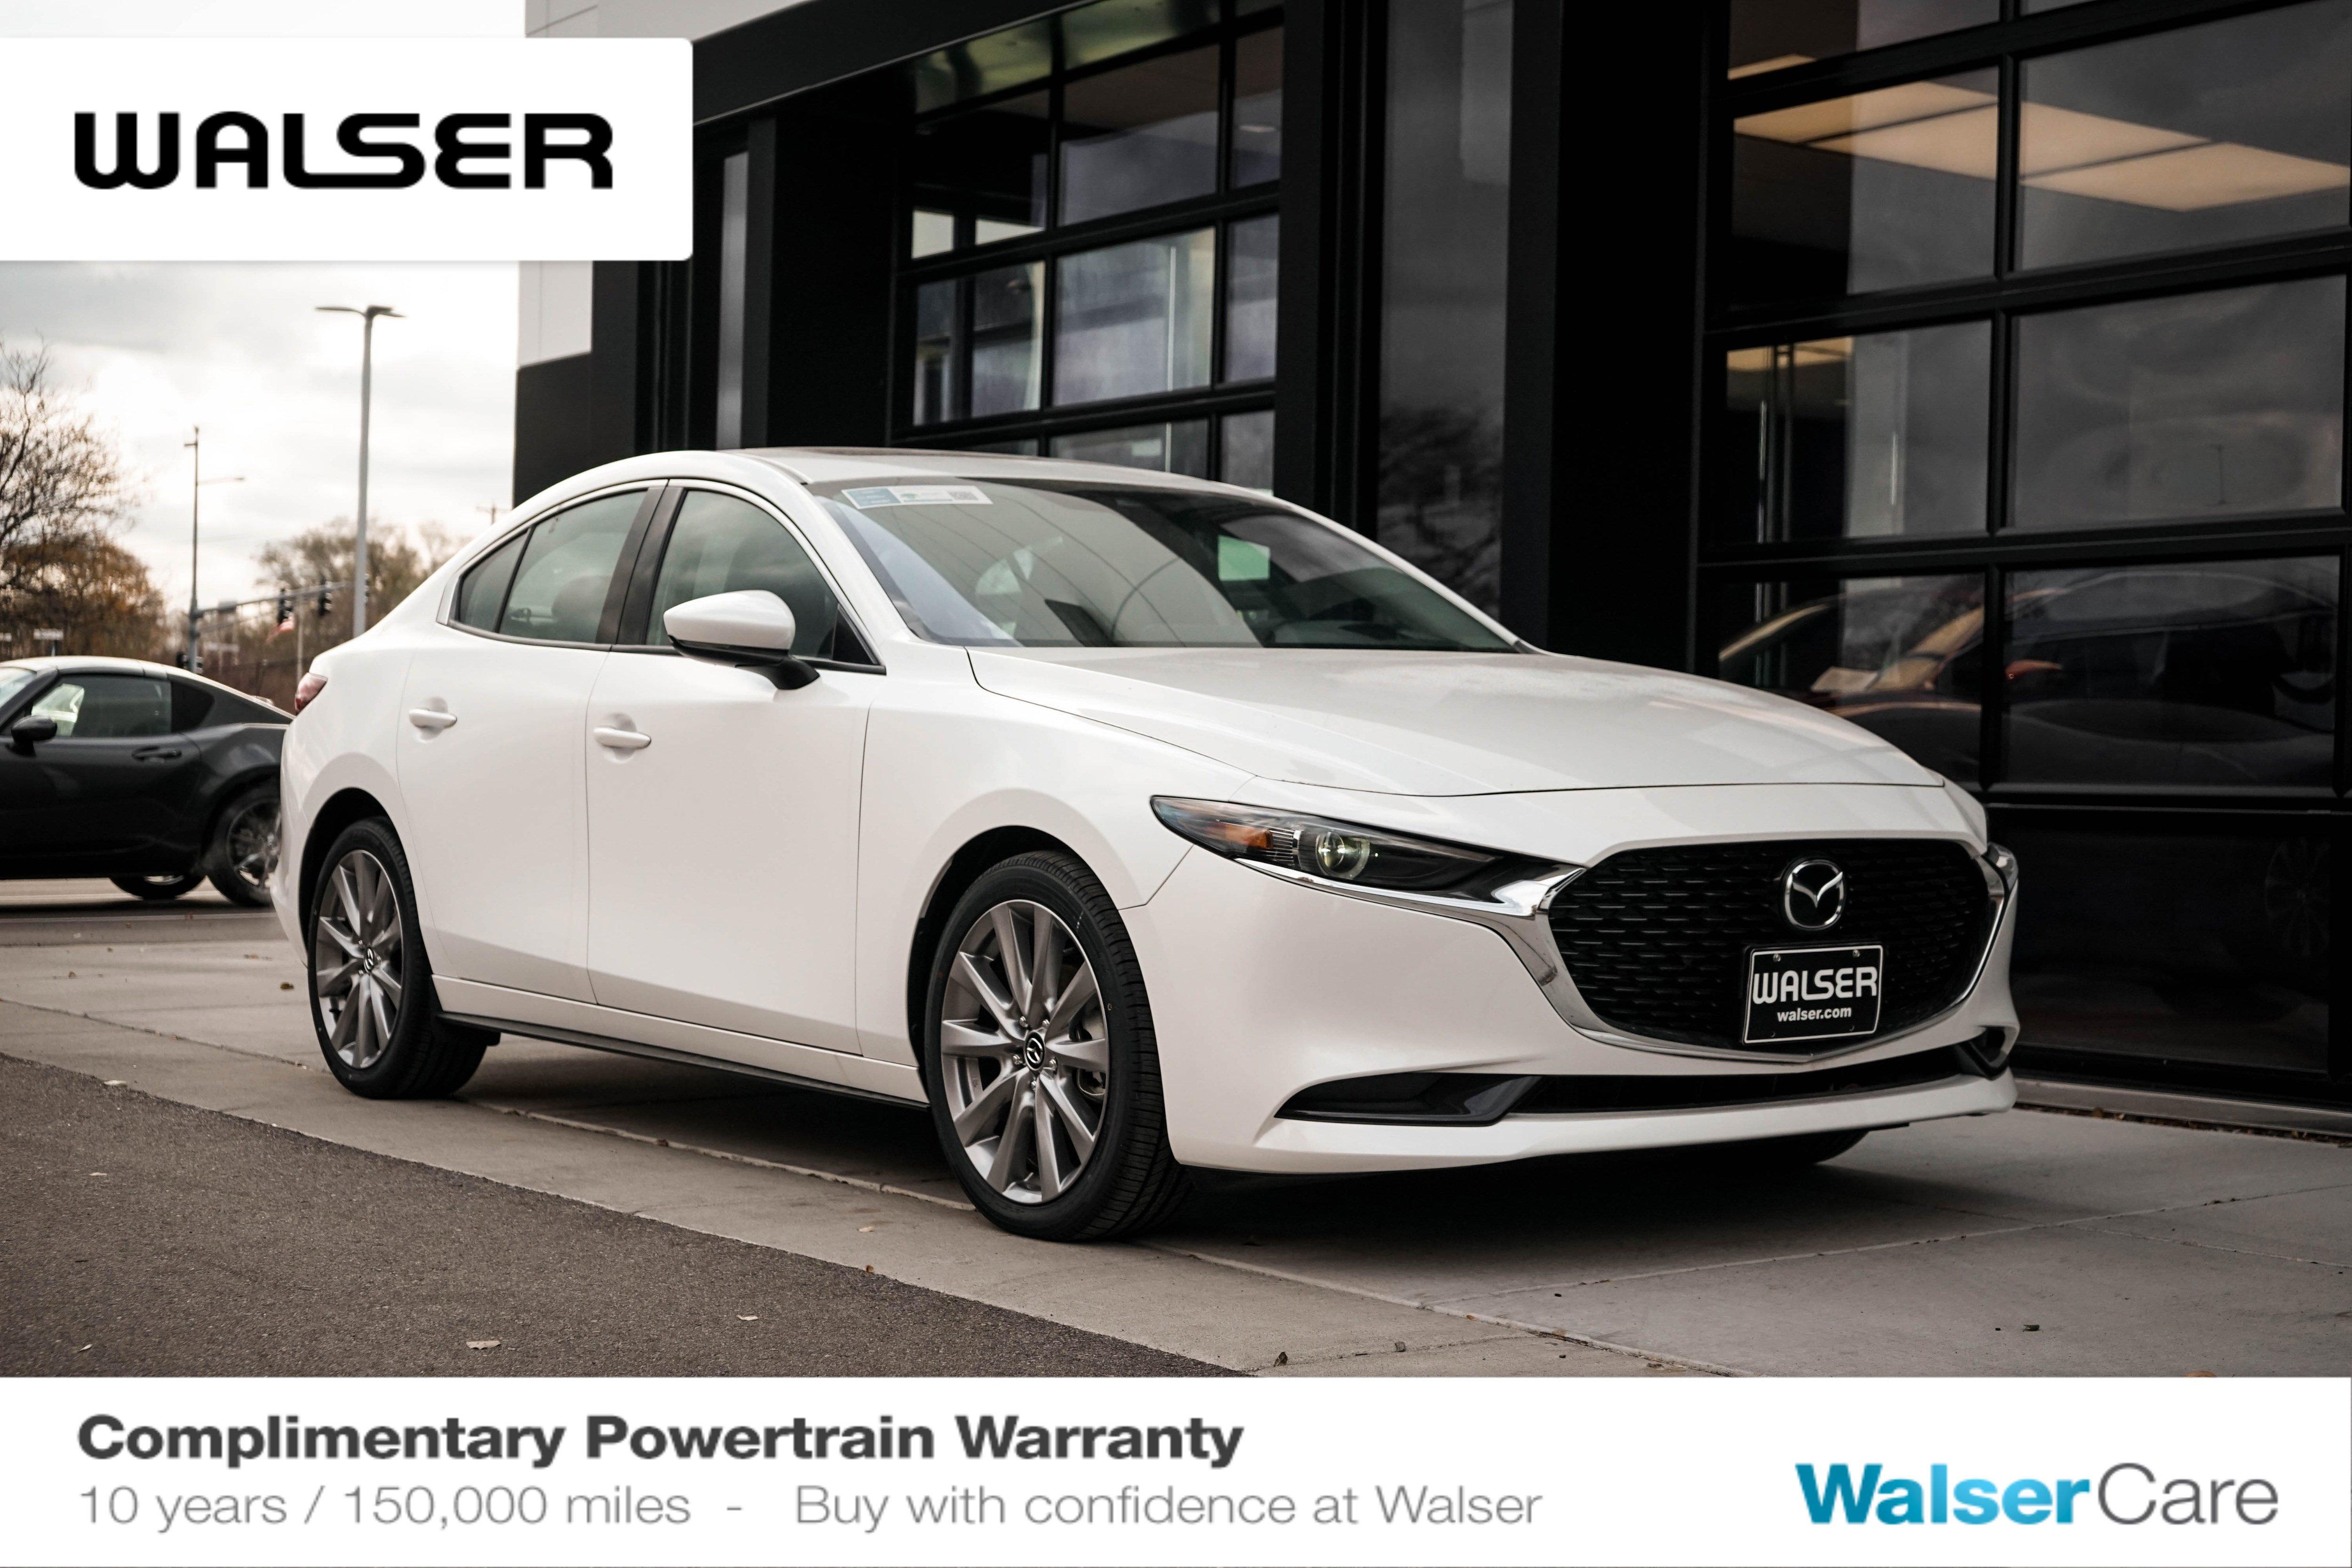 New 2019 Mazda3 Sedan w/Premium Pkg